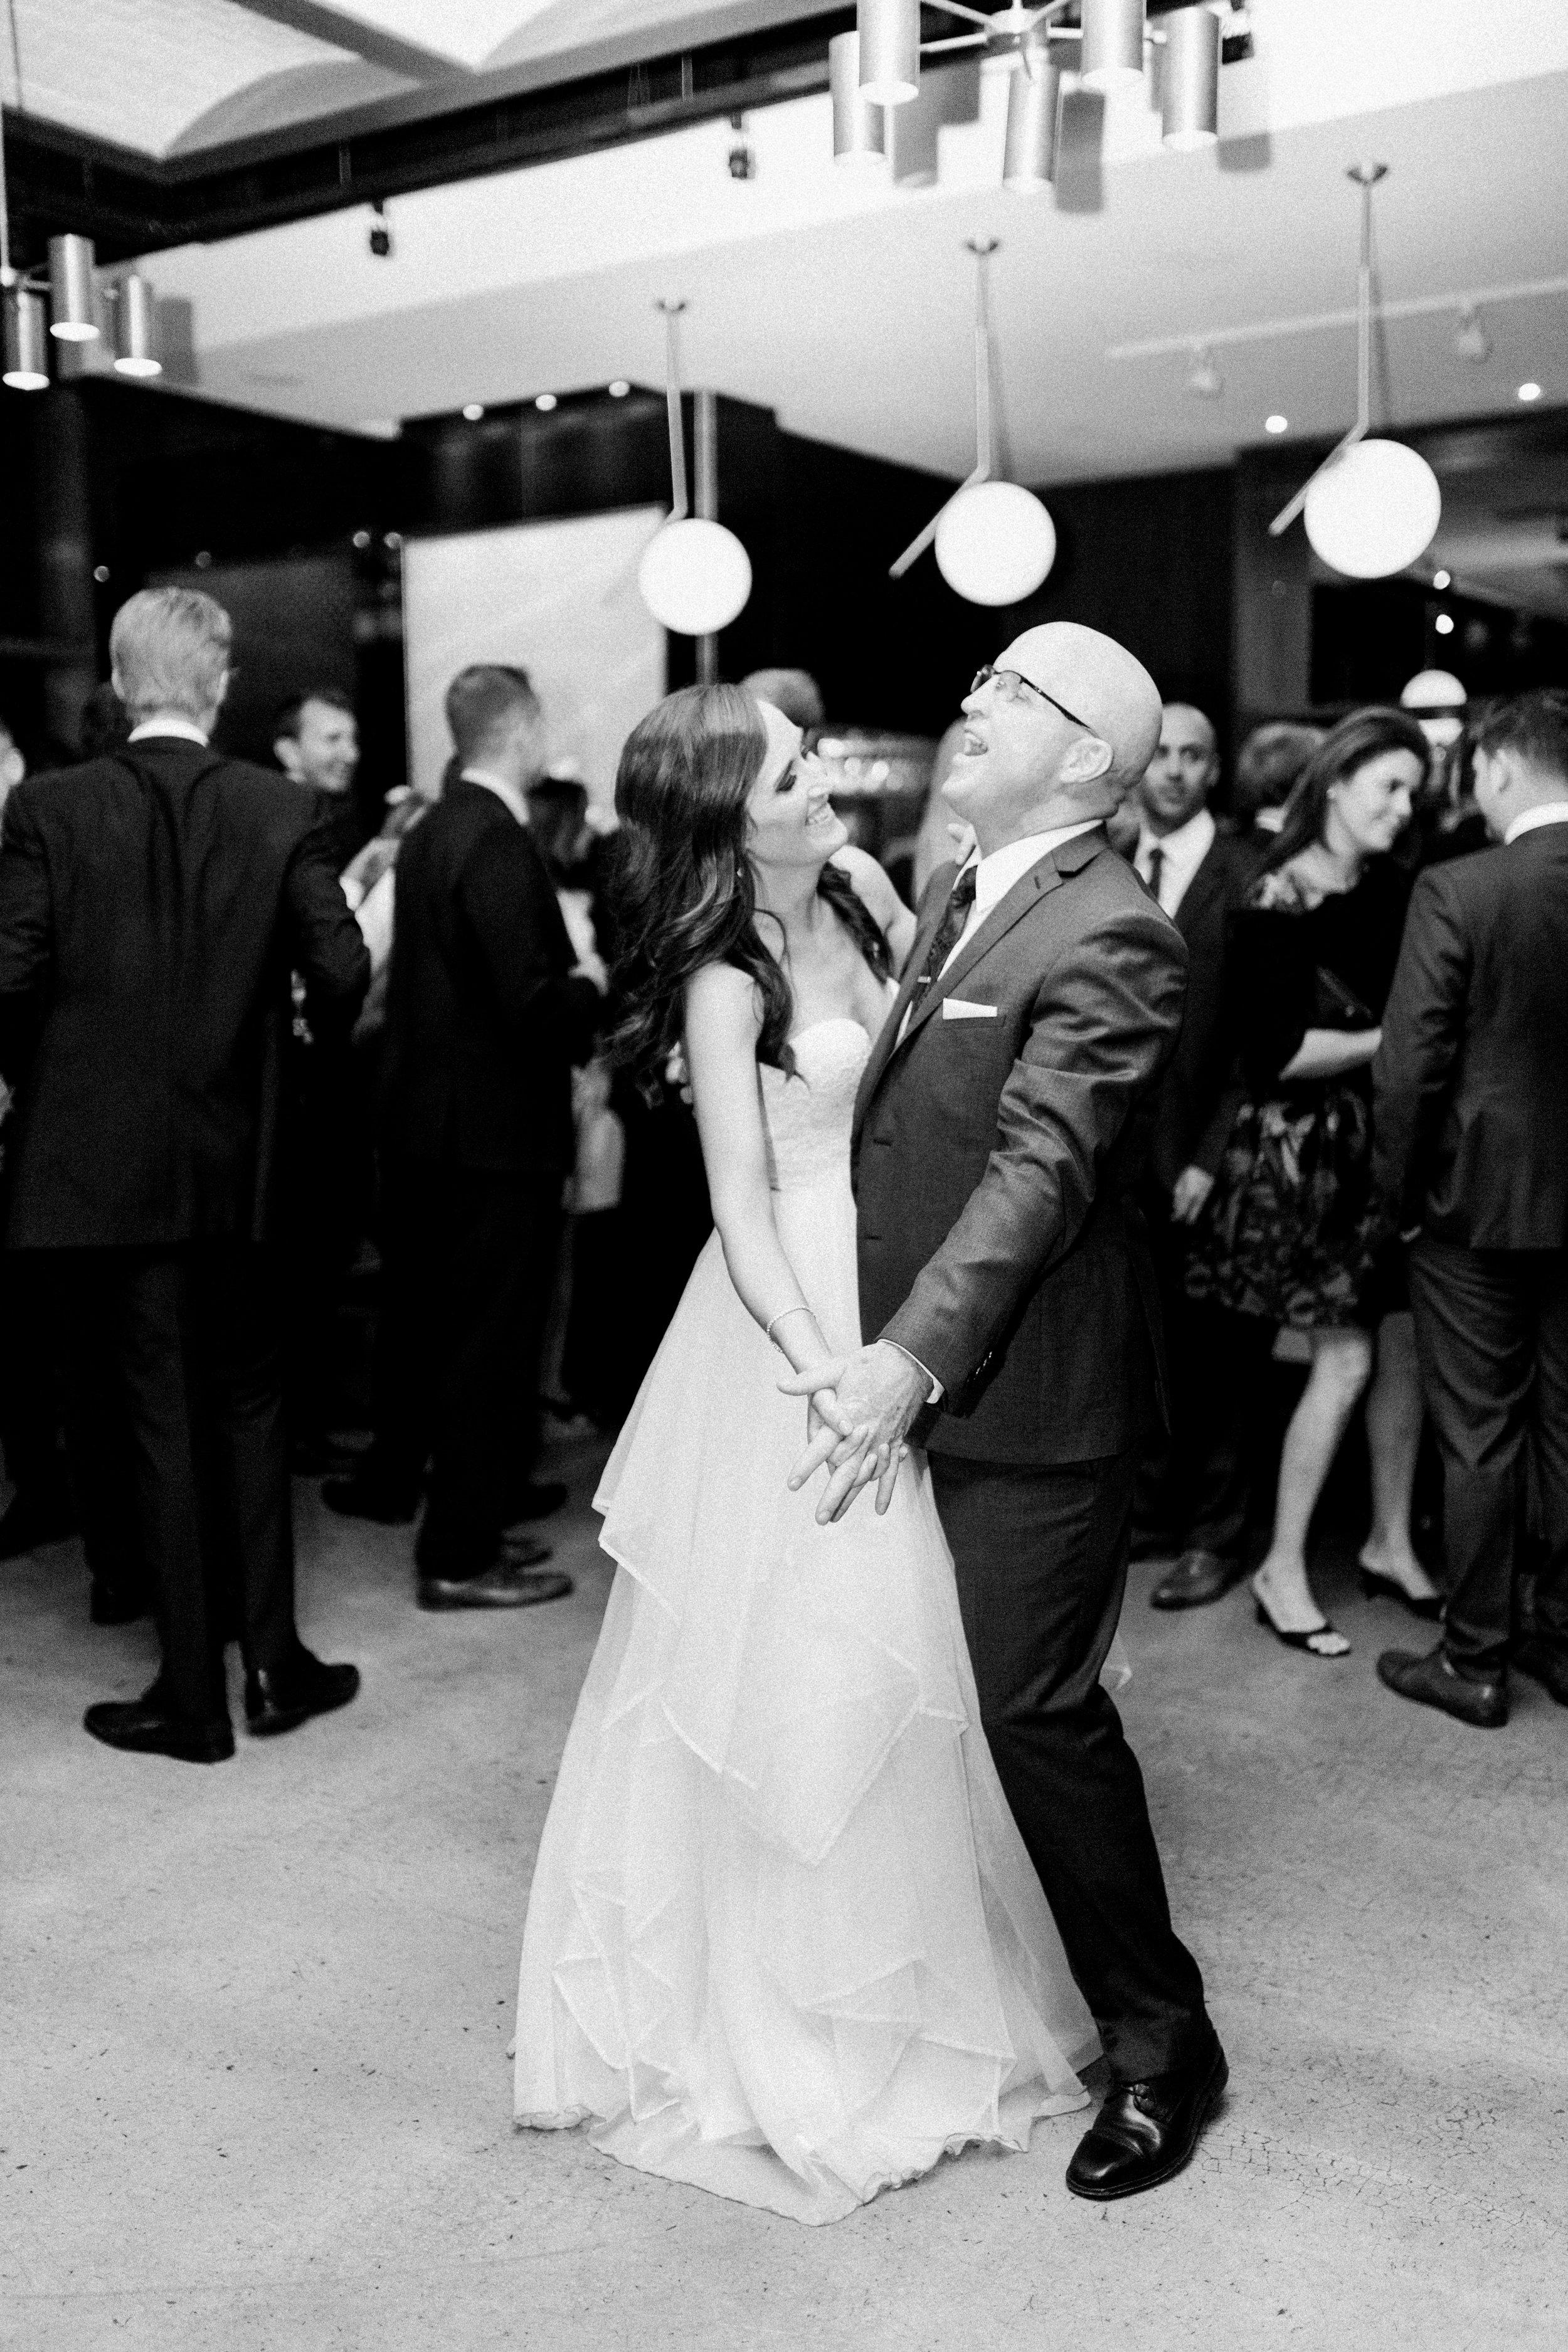 Toronto Fine Art Photographer - 180 Restaurant Wedding - Ceremony-162.jpg